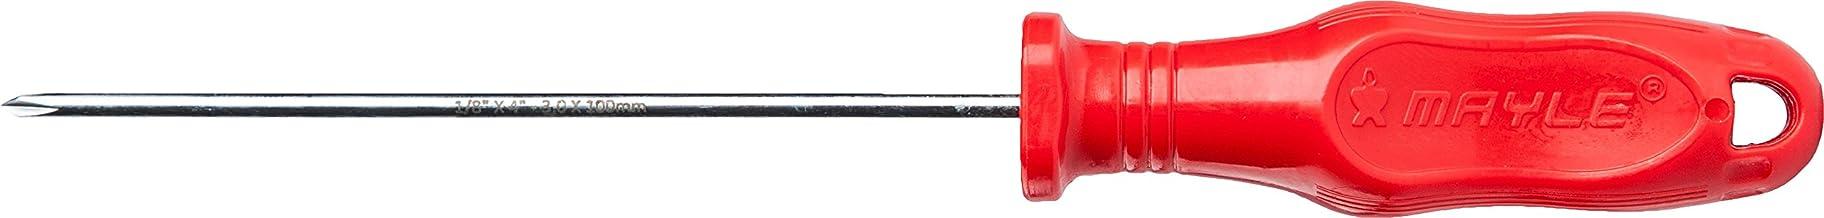 "Chave Phillips Mayle Vermelha 3/16""x4"" - 47x100mm"